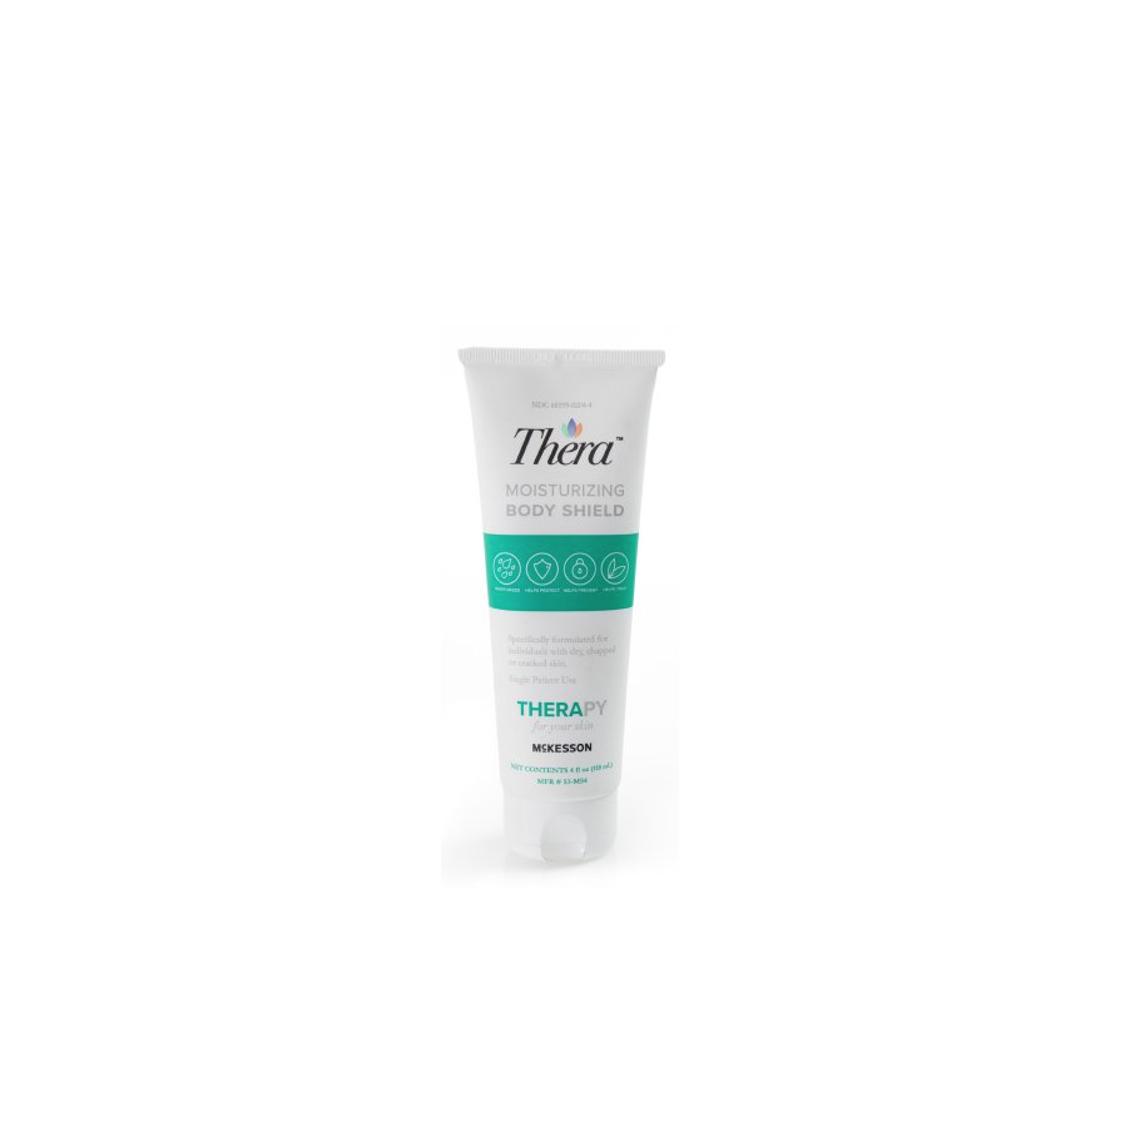 Skin Protectant Thera® 4 oz. Tube Scented Cream